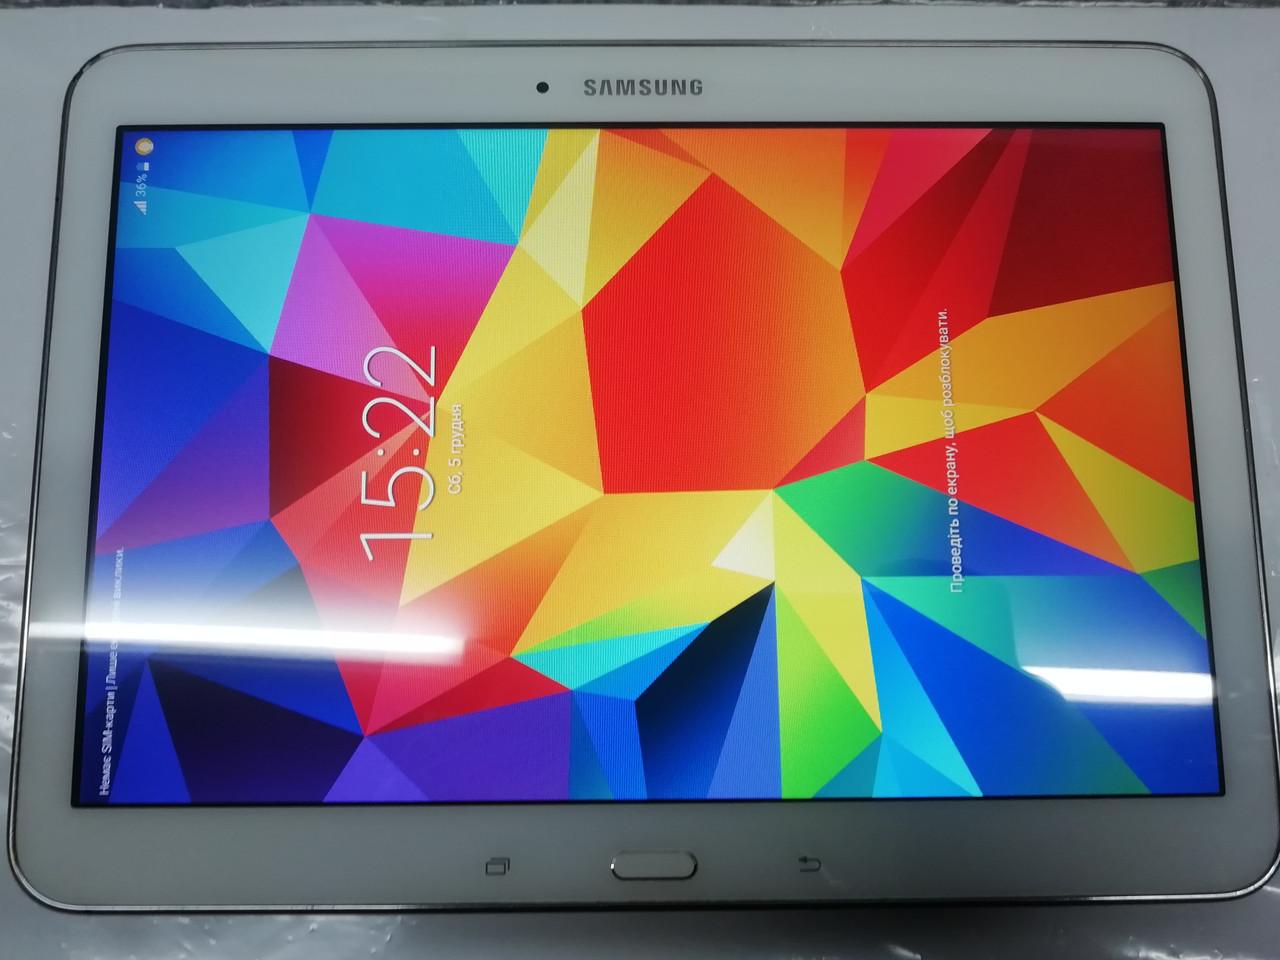 "Великий потужний 10"" планшет Samsung Galaxy Tab 4 з 3G модемом"